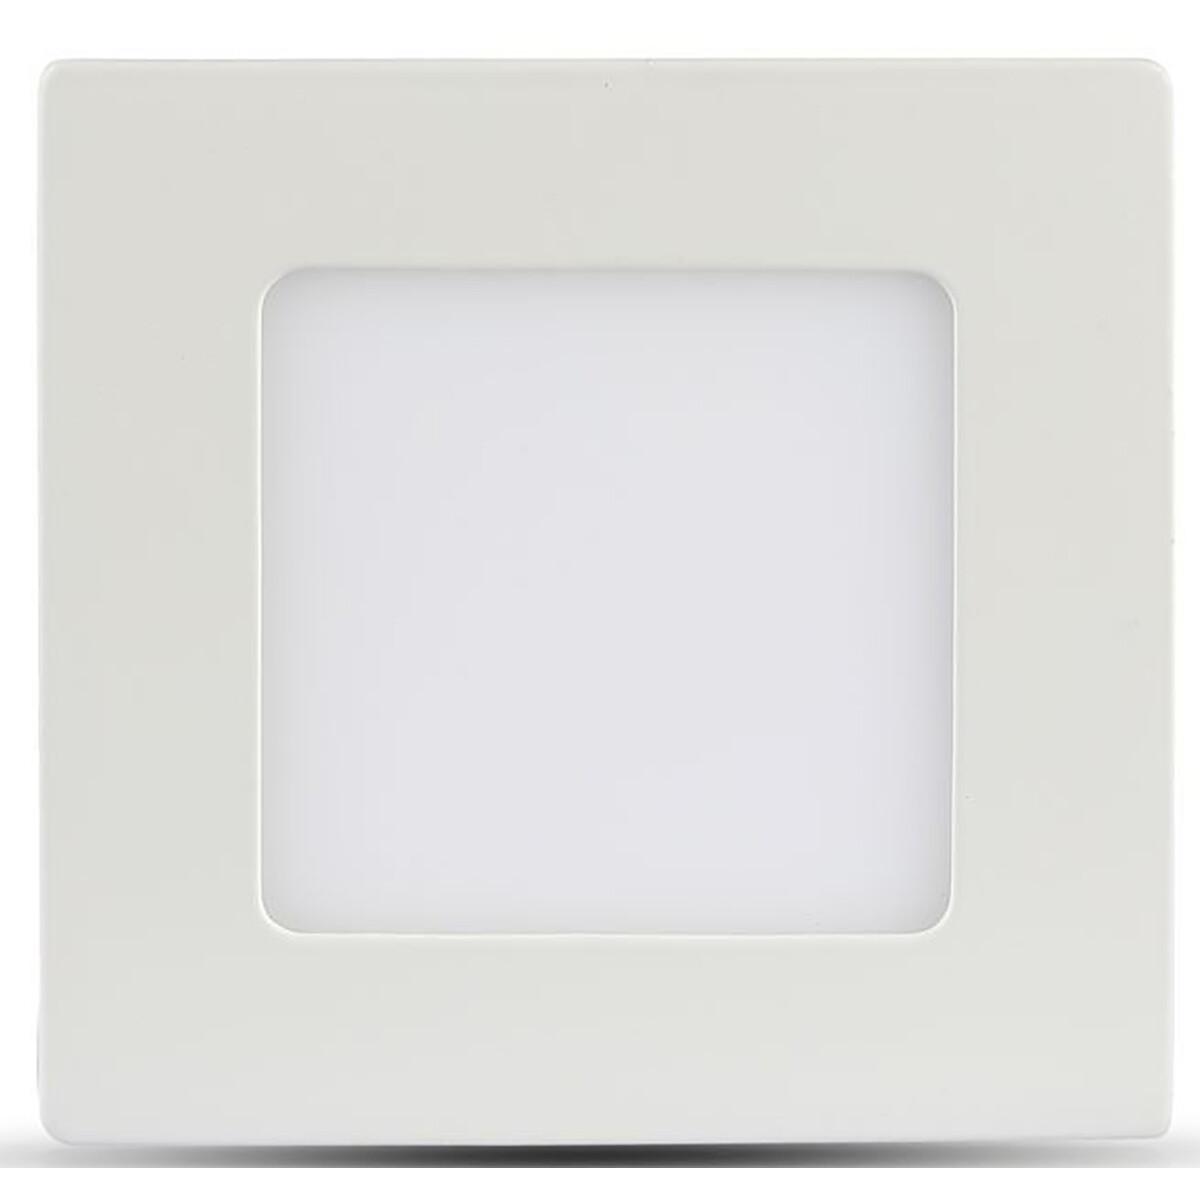 SAMSUNG - LED Downlight Slim - Viron Dunson - Inbouw Vierkant 24W - Warm Wit 3000K - Mat Wit - Alumi